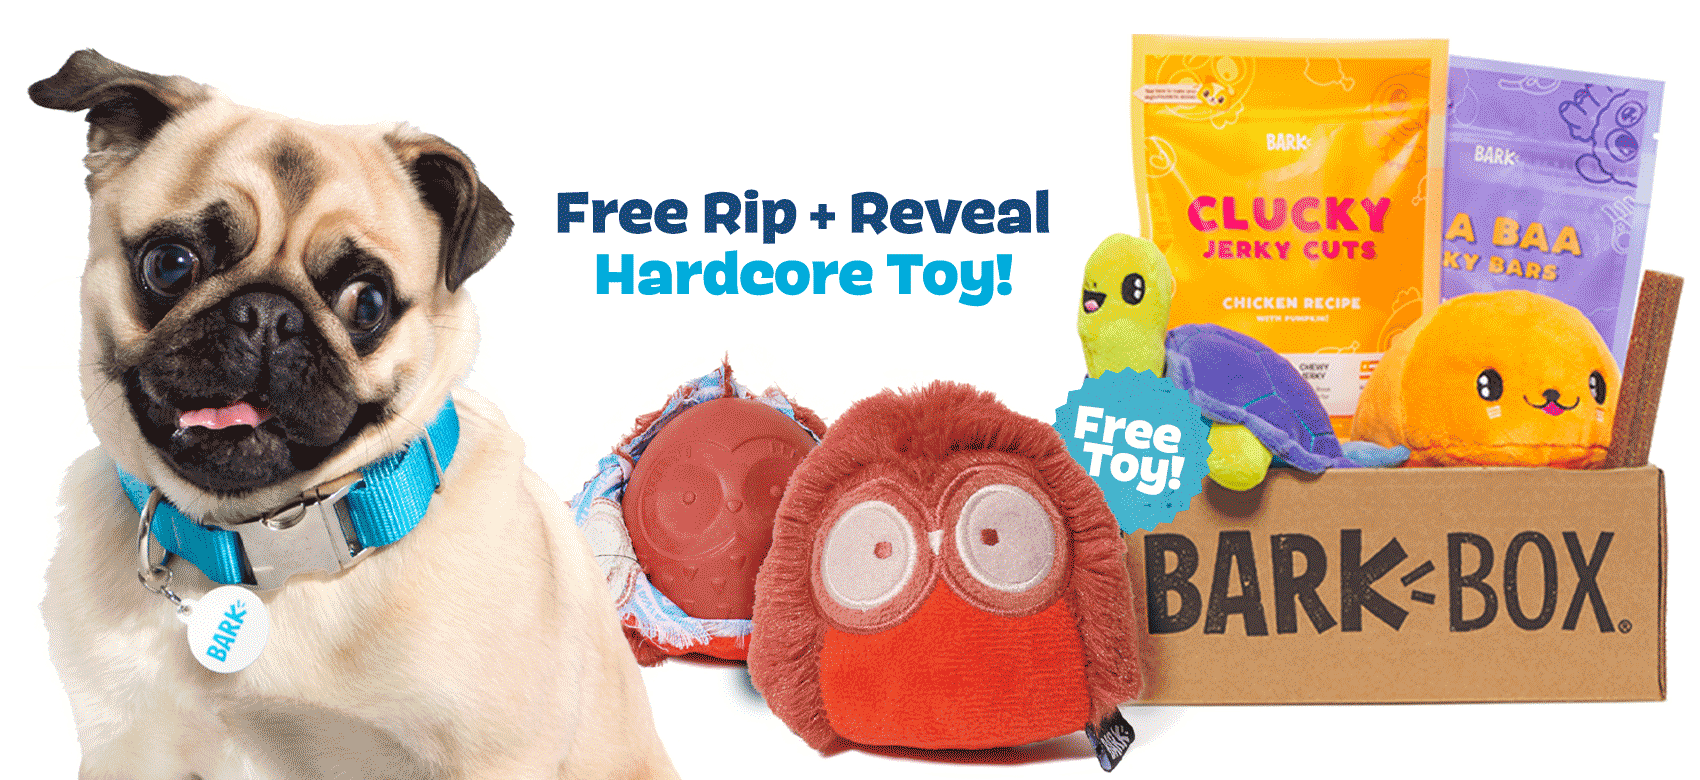 BarkBox Coupon Code – Free Olga the Owl Rip & Reveal Toy!